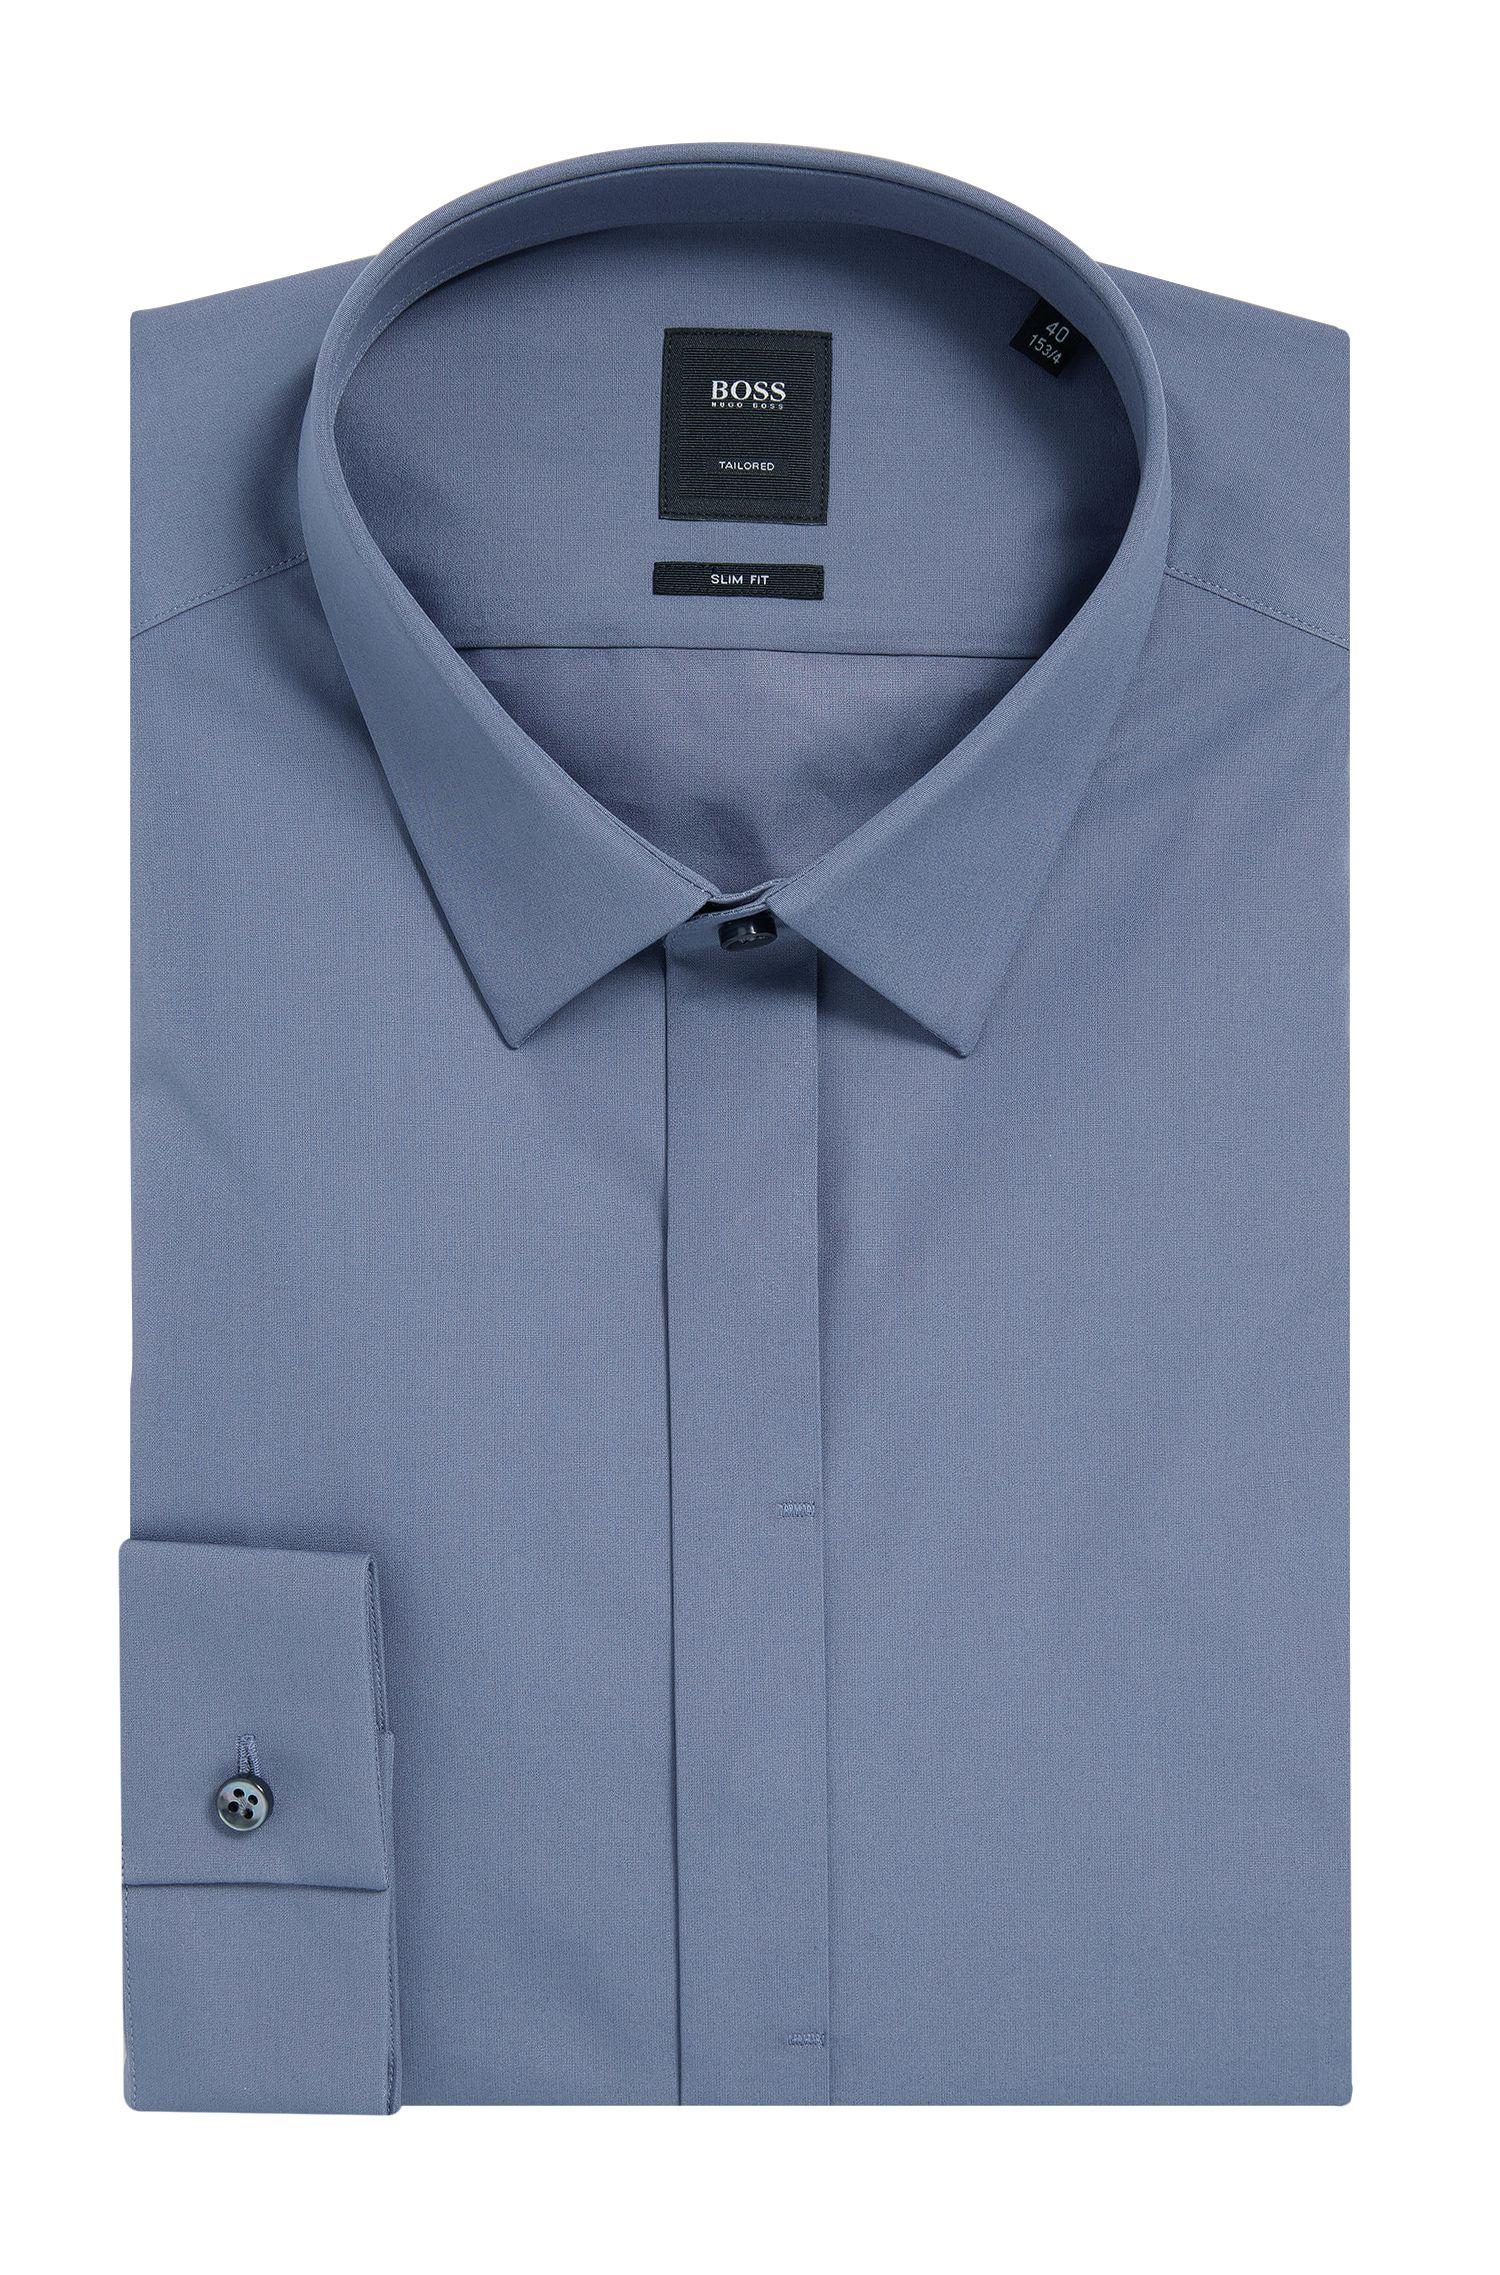 2-Ply Cotton Dress Shirt, Slim Fit | T-Craig